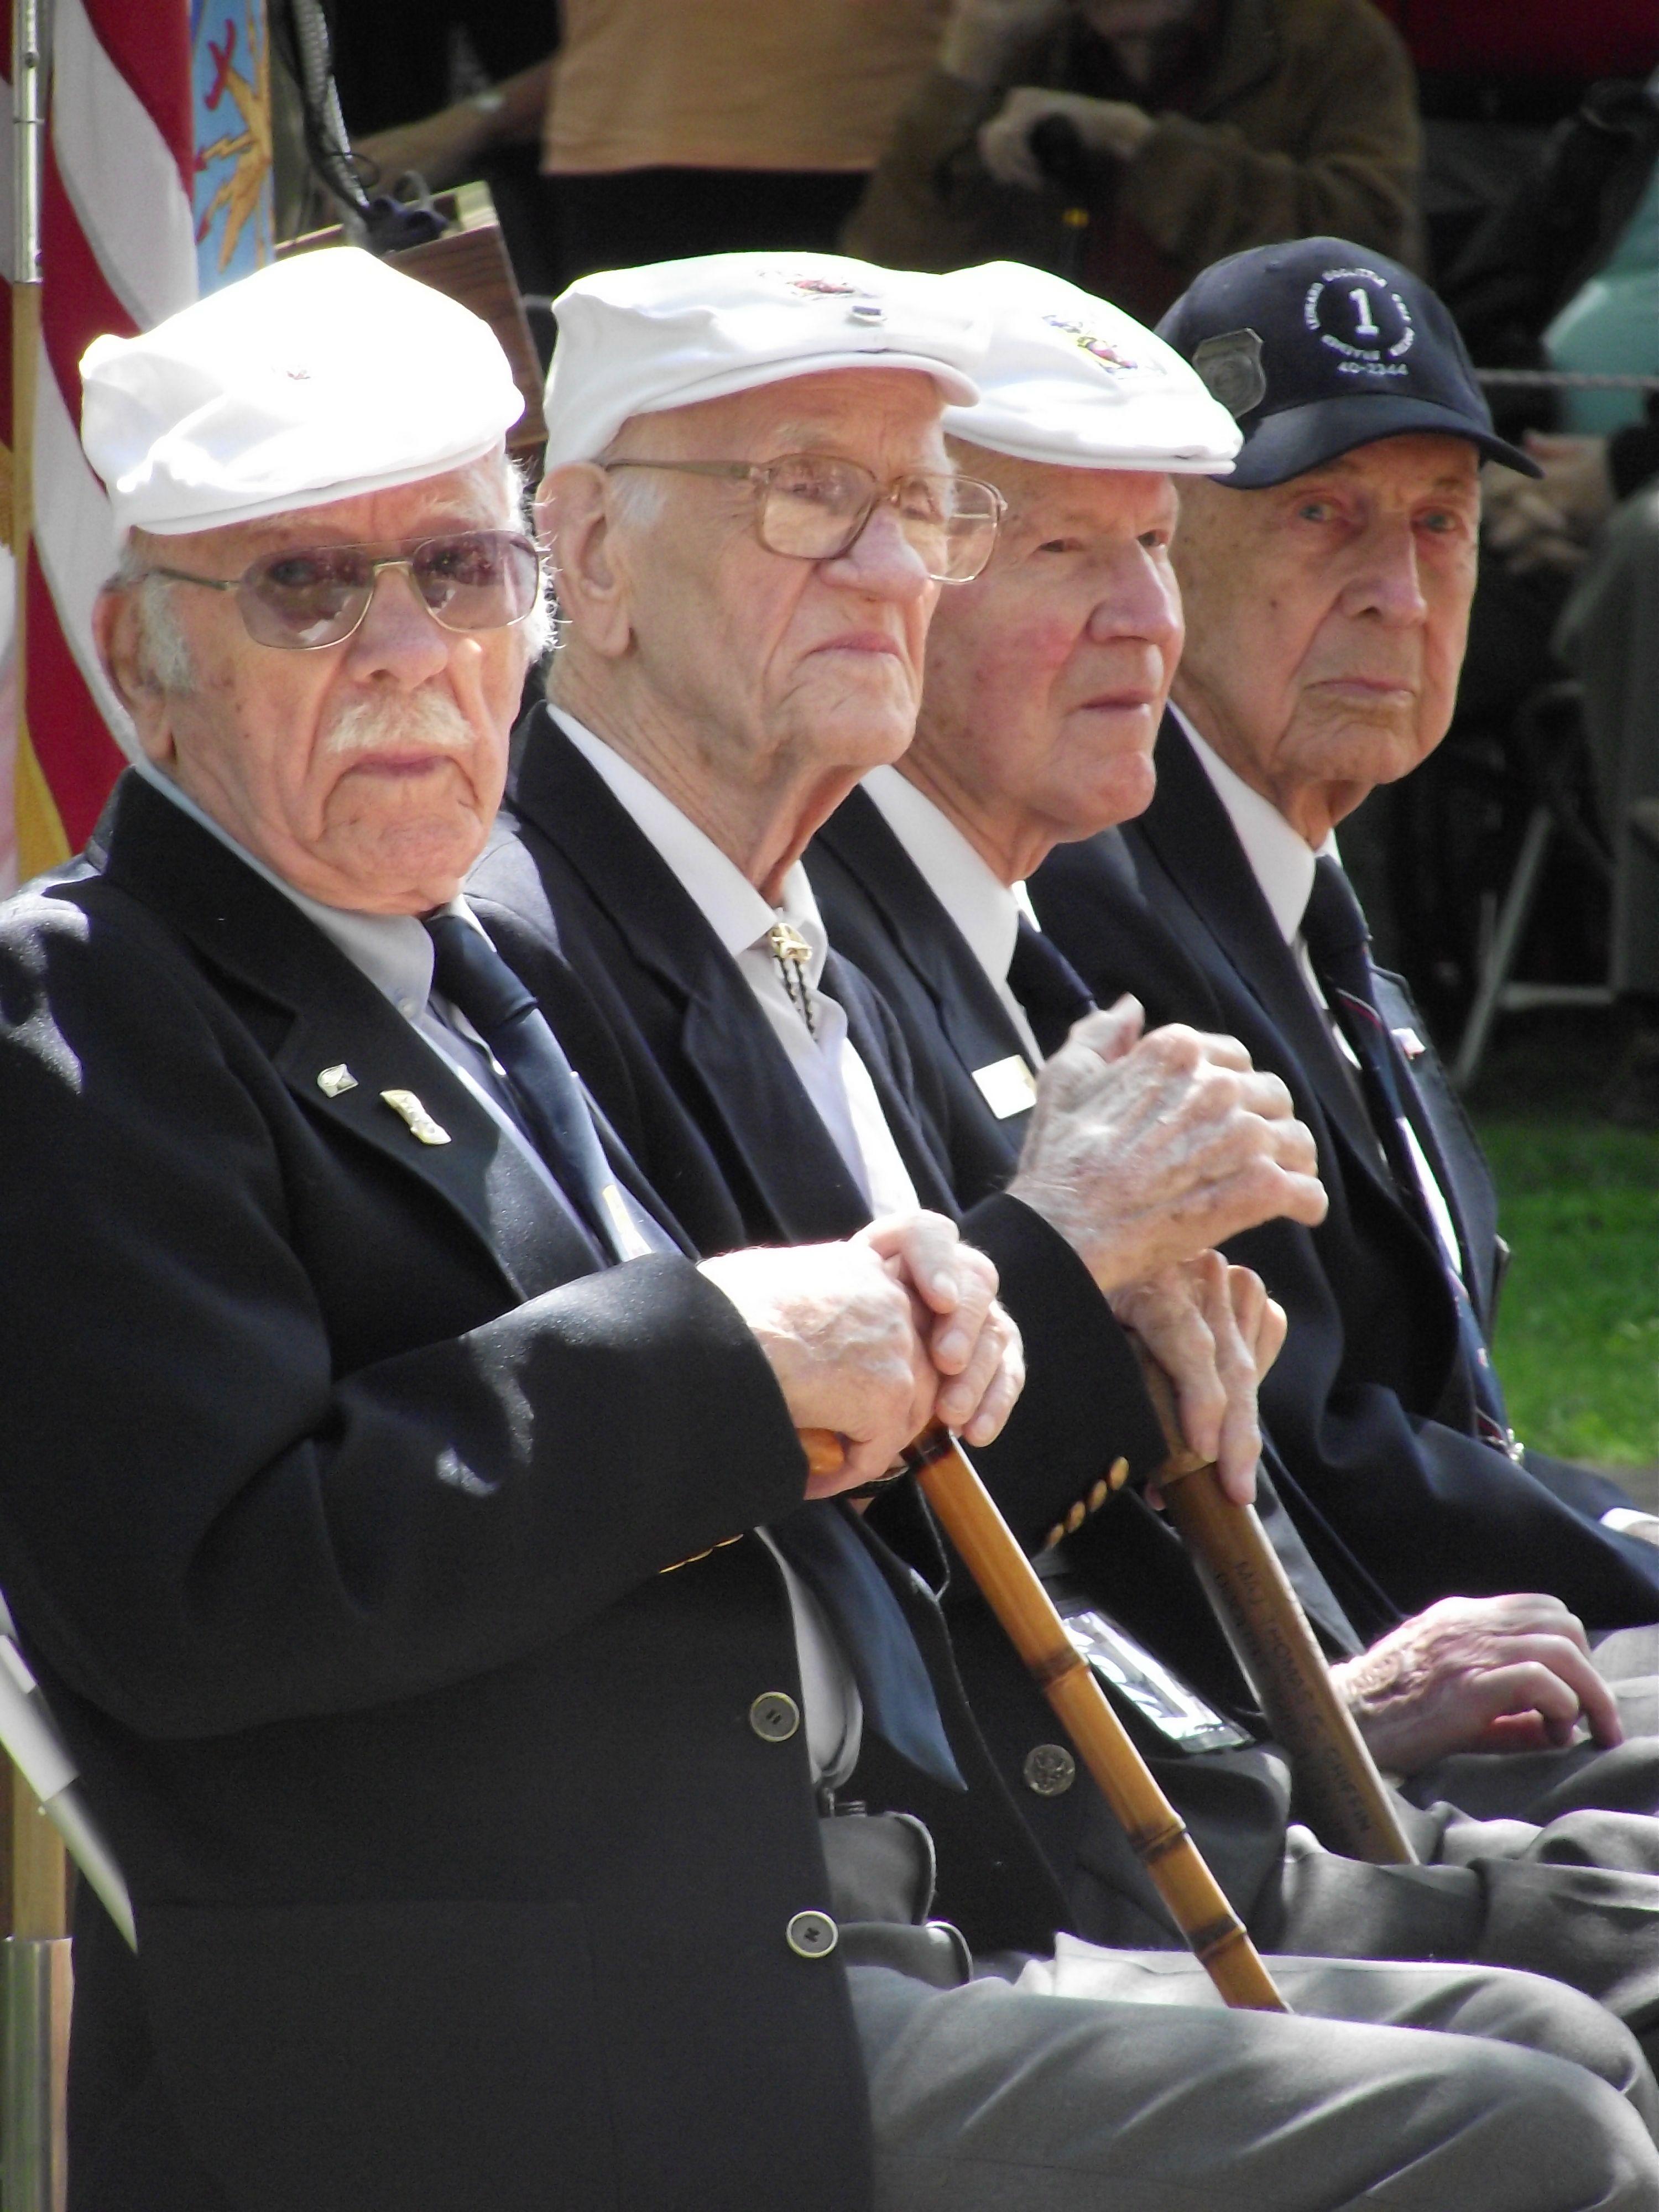 Doolittle Raiders 70th Anniversary Reunion, Air Force